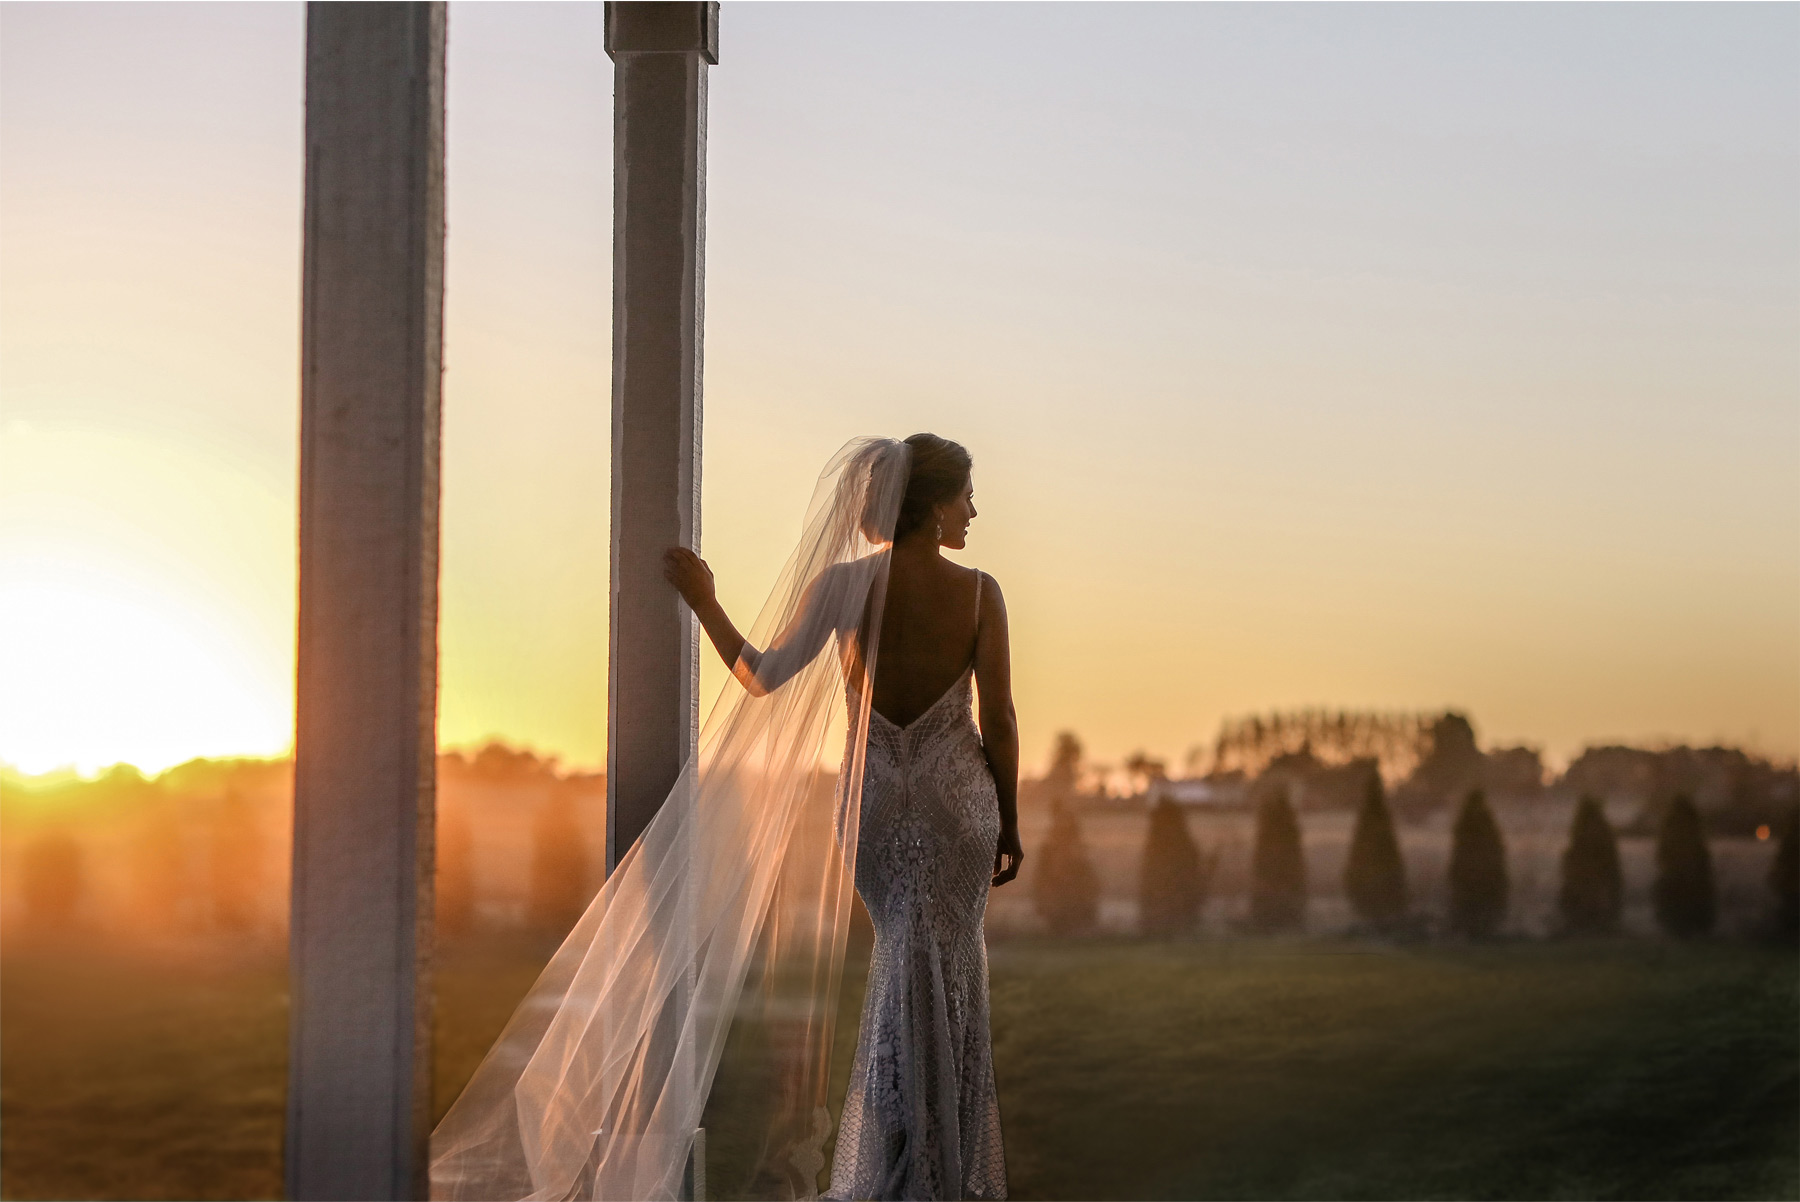 17-Ashery-Lane-Farm-Minneapolis-Minnesota-Wedding-Styled-Shoot-New-Venue-Barn-Orchard-Vineyard-Sunset.jpg